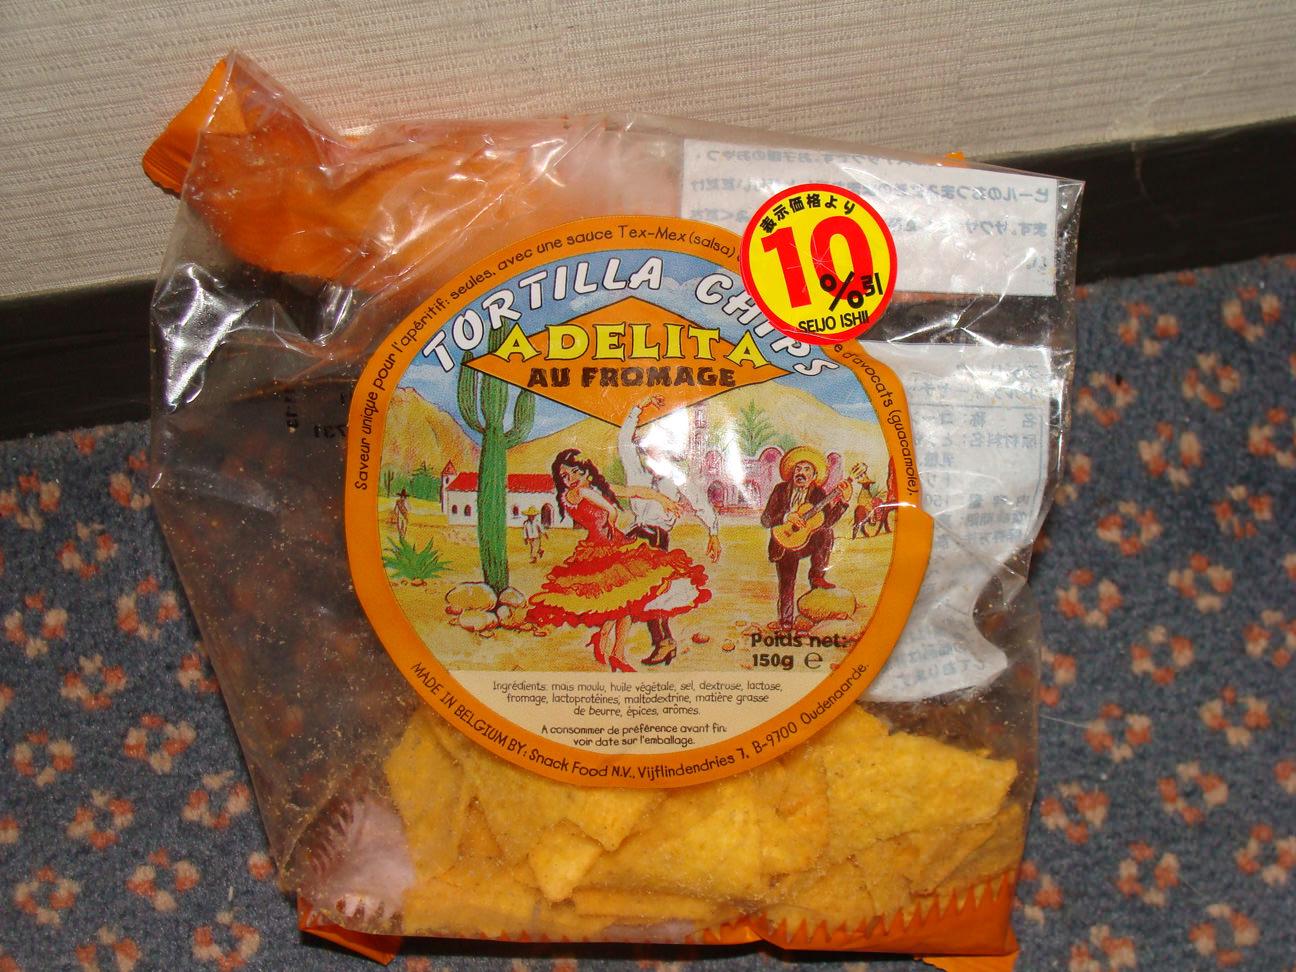 Tortilla Chips Adelita au Fromage I got from the Super Market at Shinagawa Station.